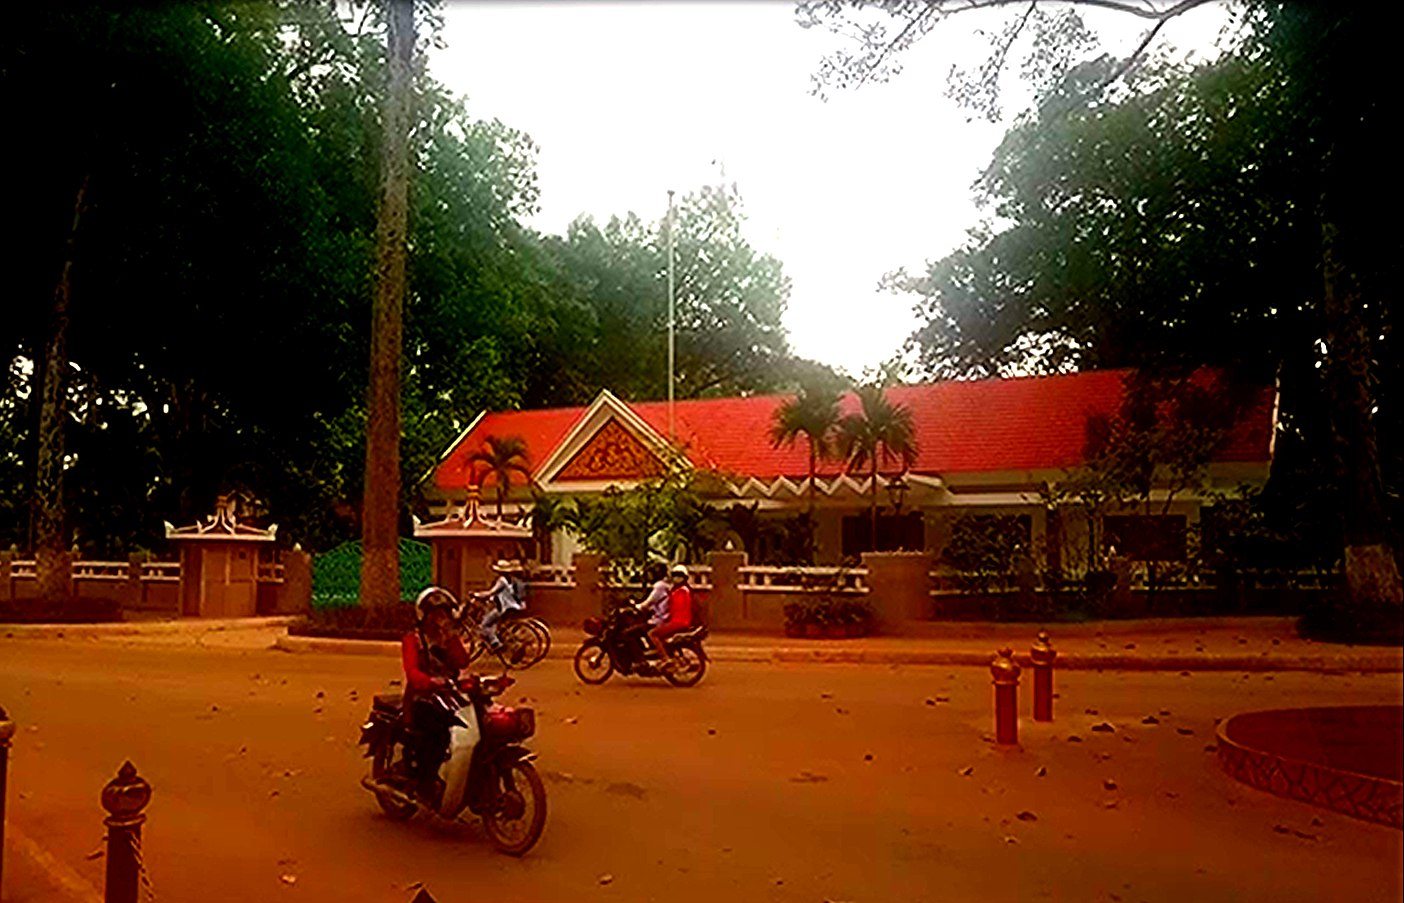 travel - Елена Руденко (Валтея). Камбоджа. Сием Рип. QH4PxY3cPXo